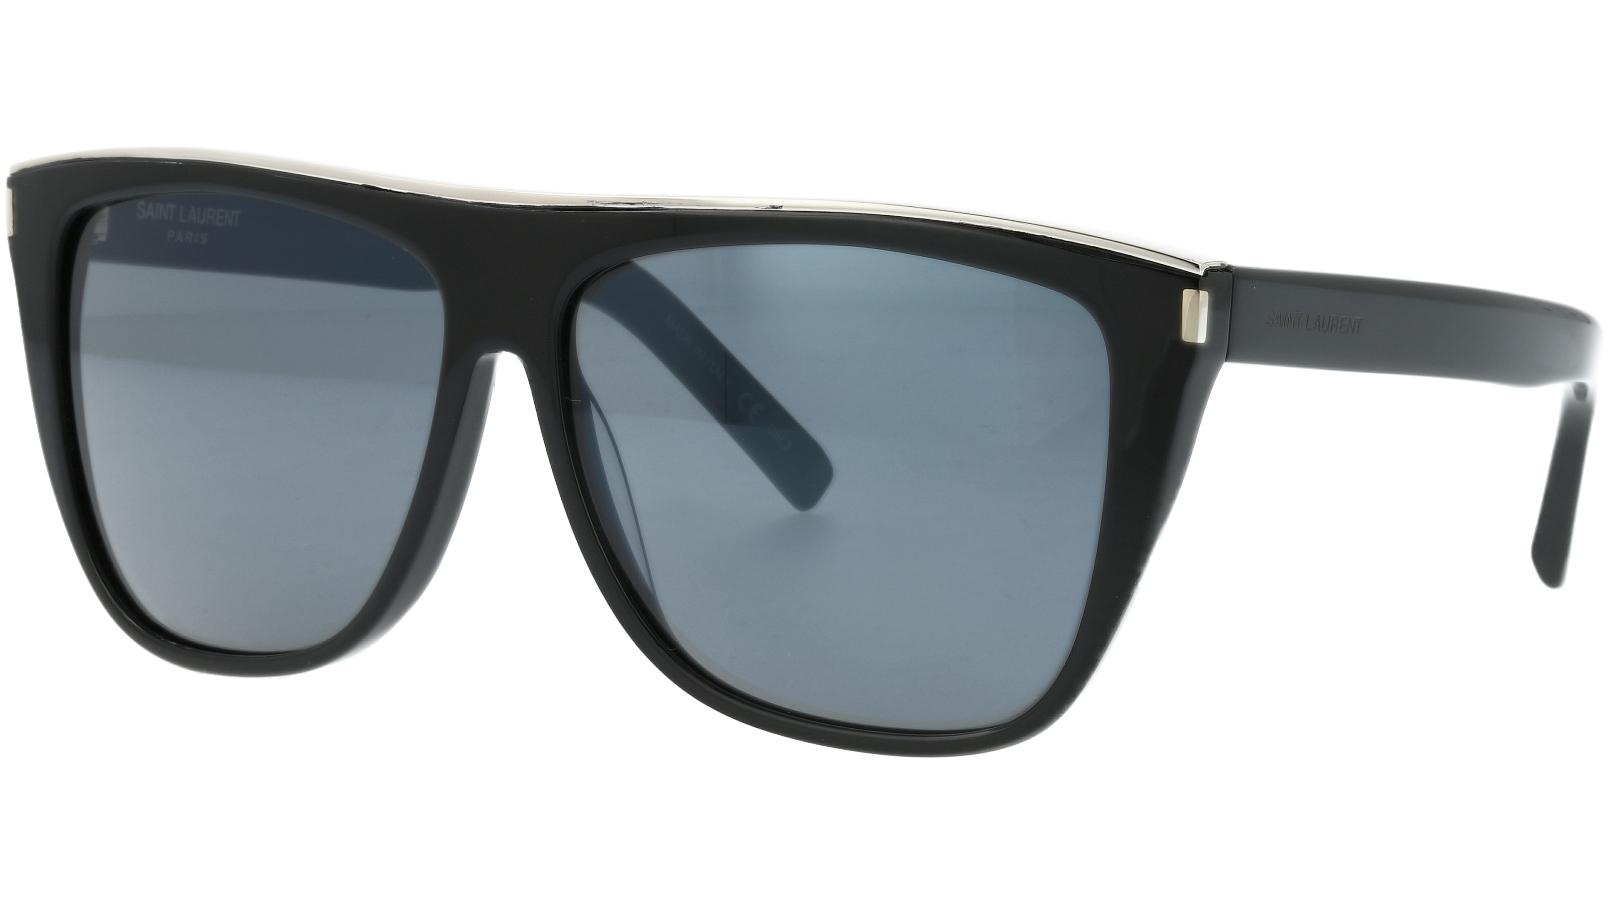 Saint Laurent SL1 COMBI 001 59 Black Sunglasses